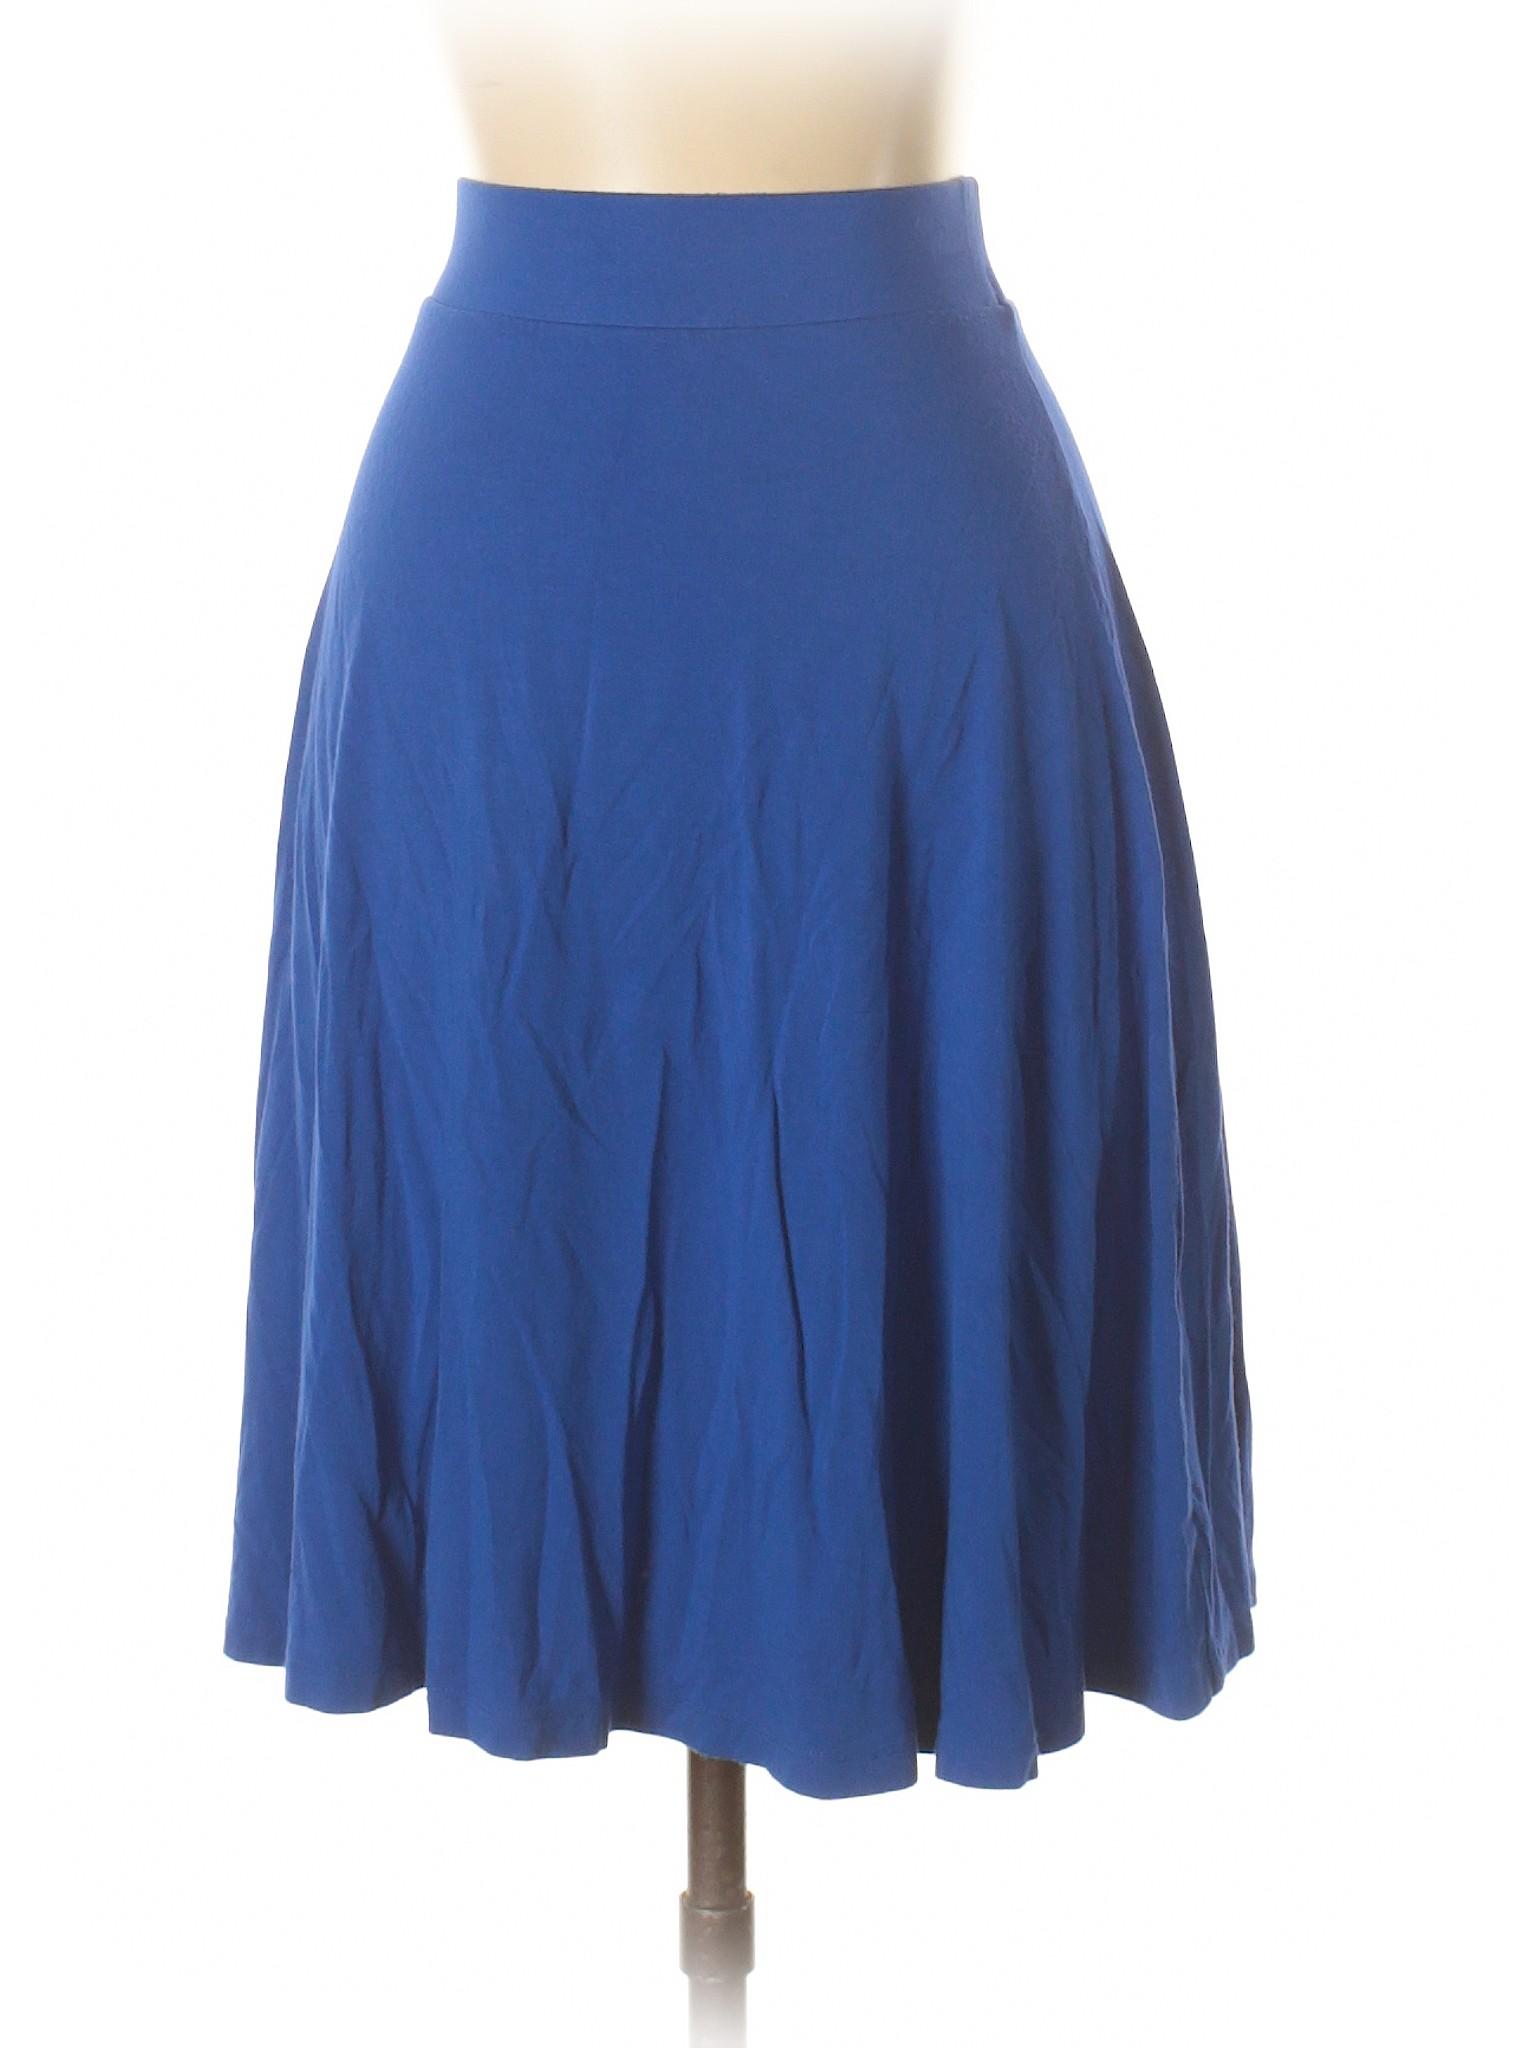 Casual Skirt York Company winter New Leisure amp; w4qXznY